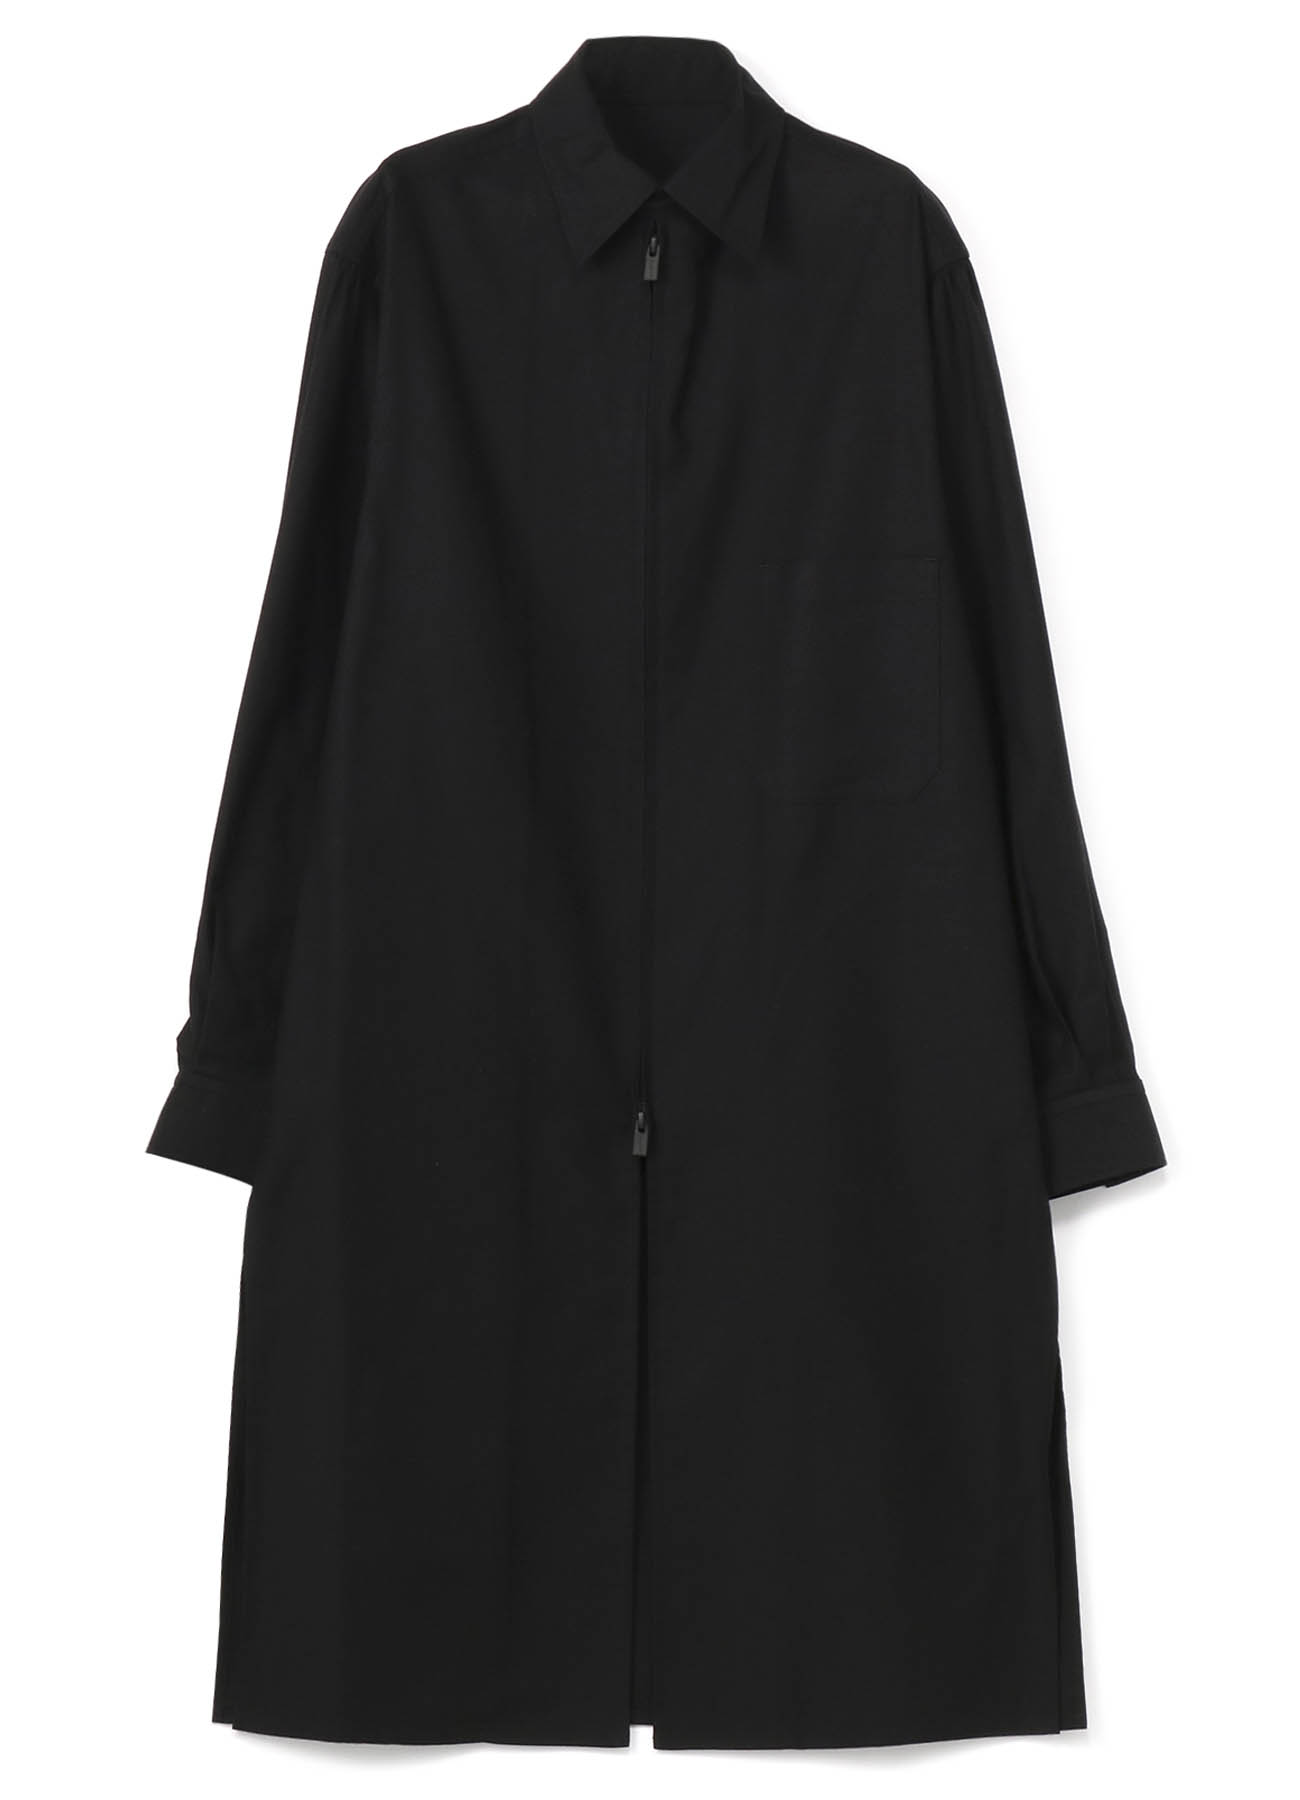 YOHJI YAMAMOTO BLACK SCANDAL  长款拉链衬衫